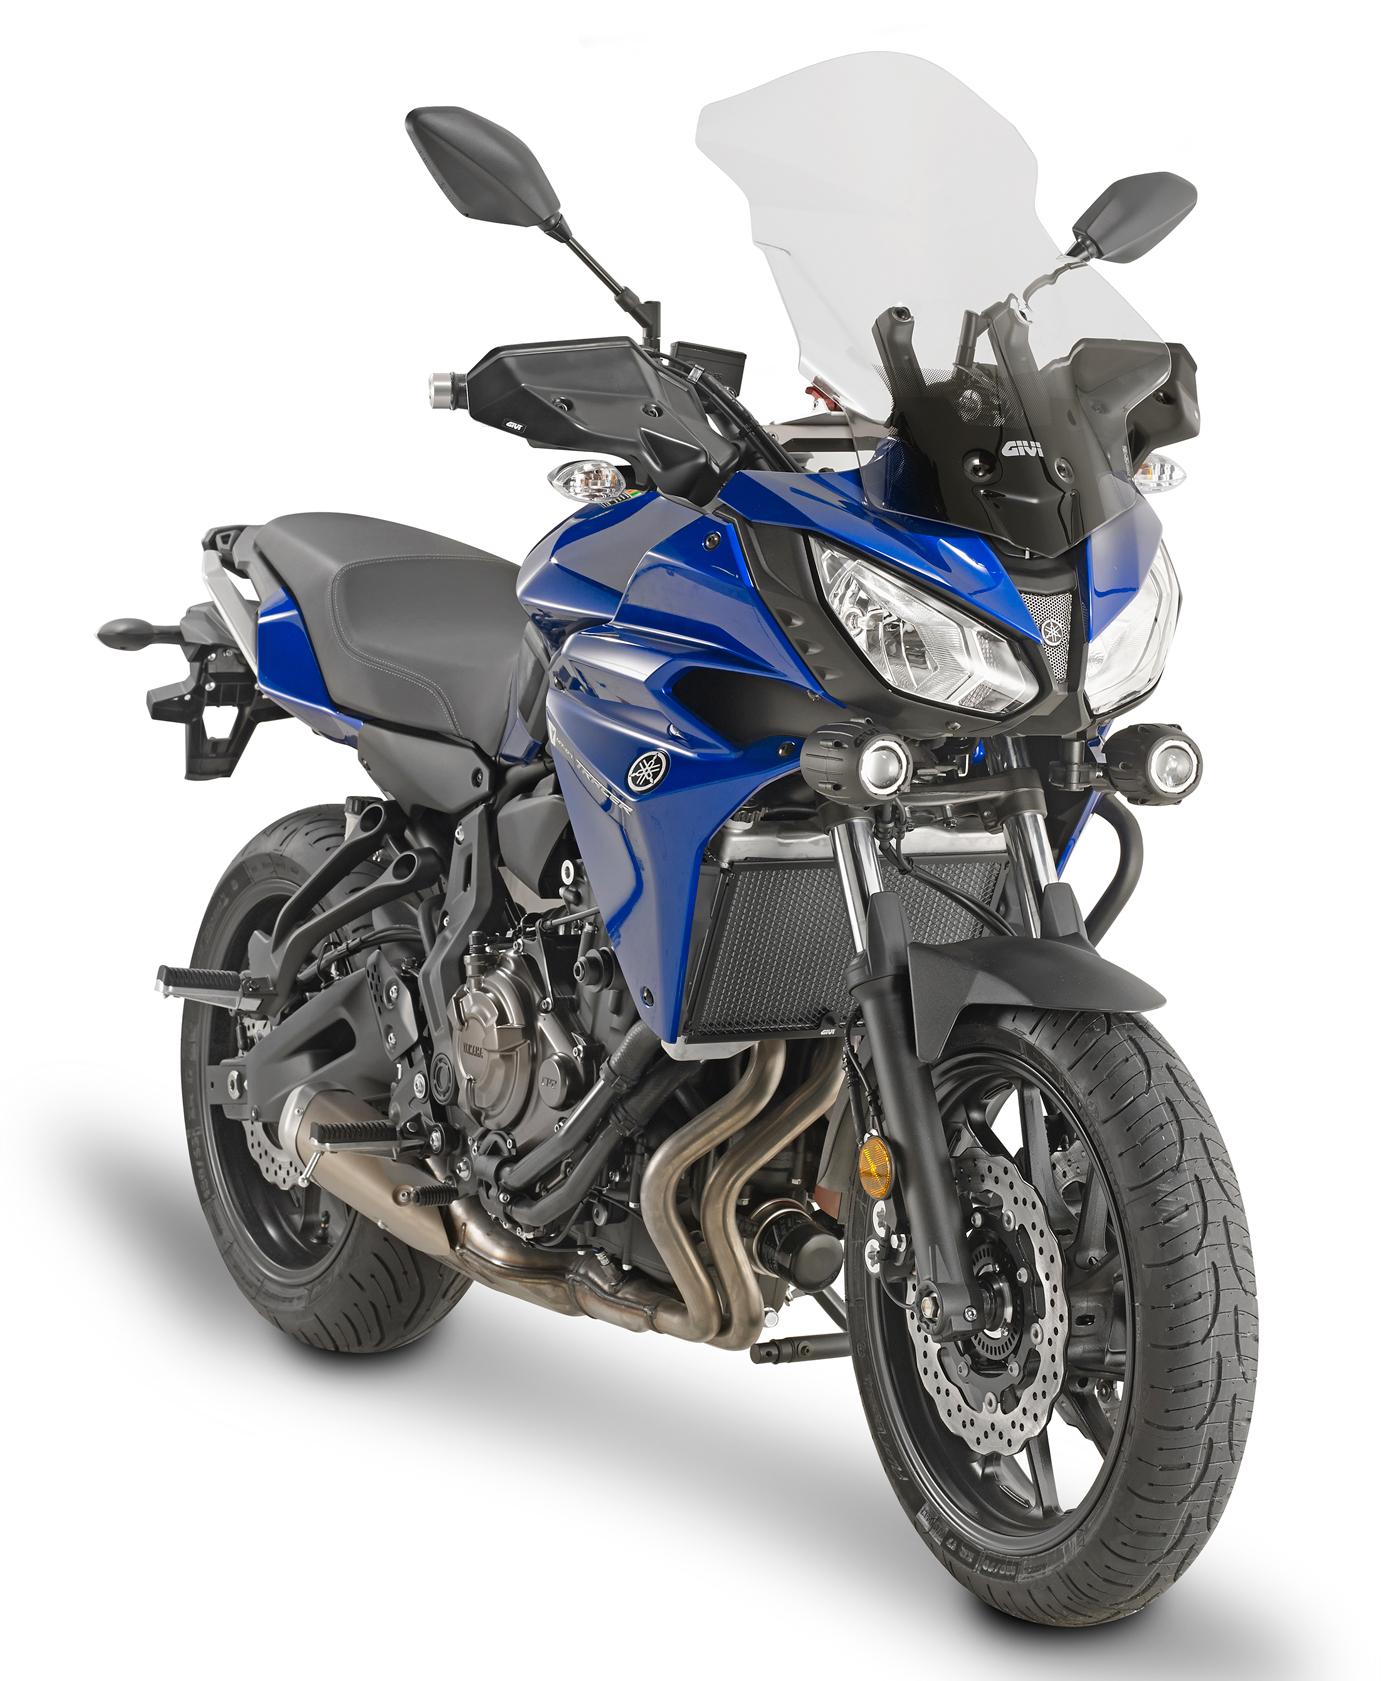 Yamaha tracer 700 idea di immagine del motociclo for Yamaha tracer 700